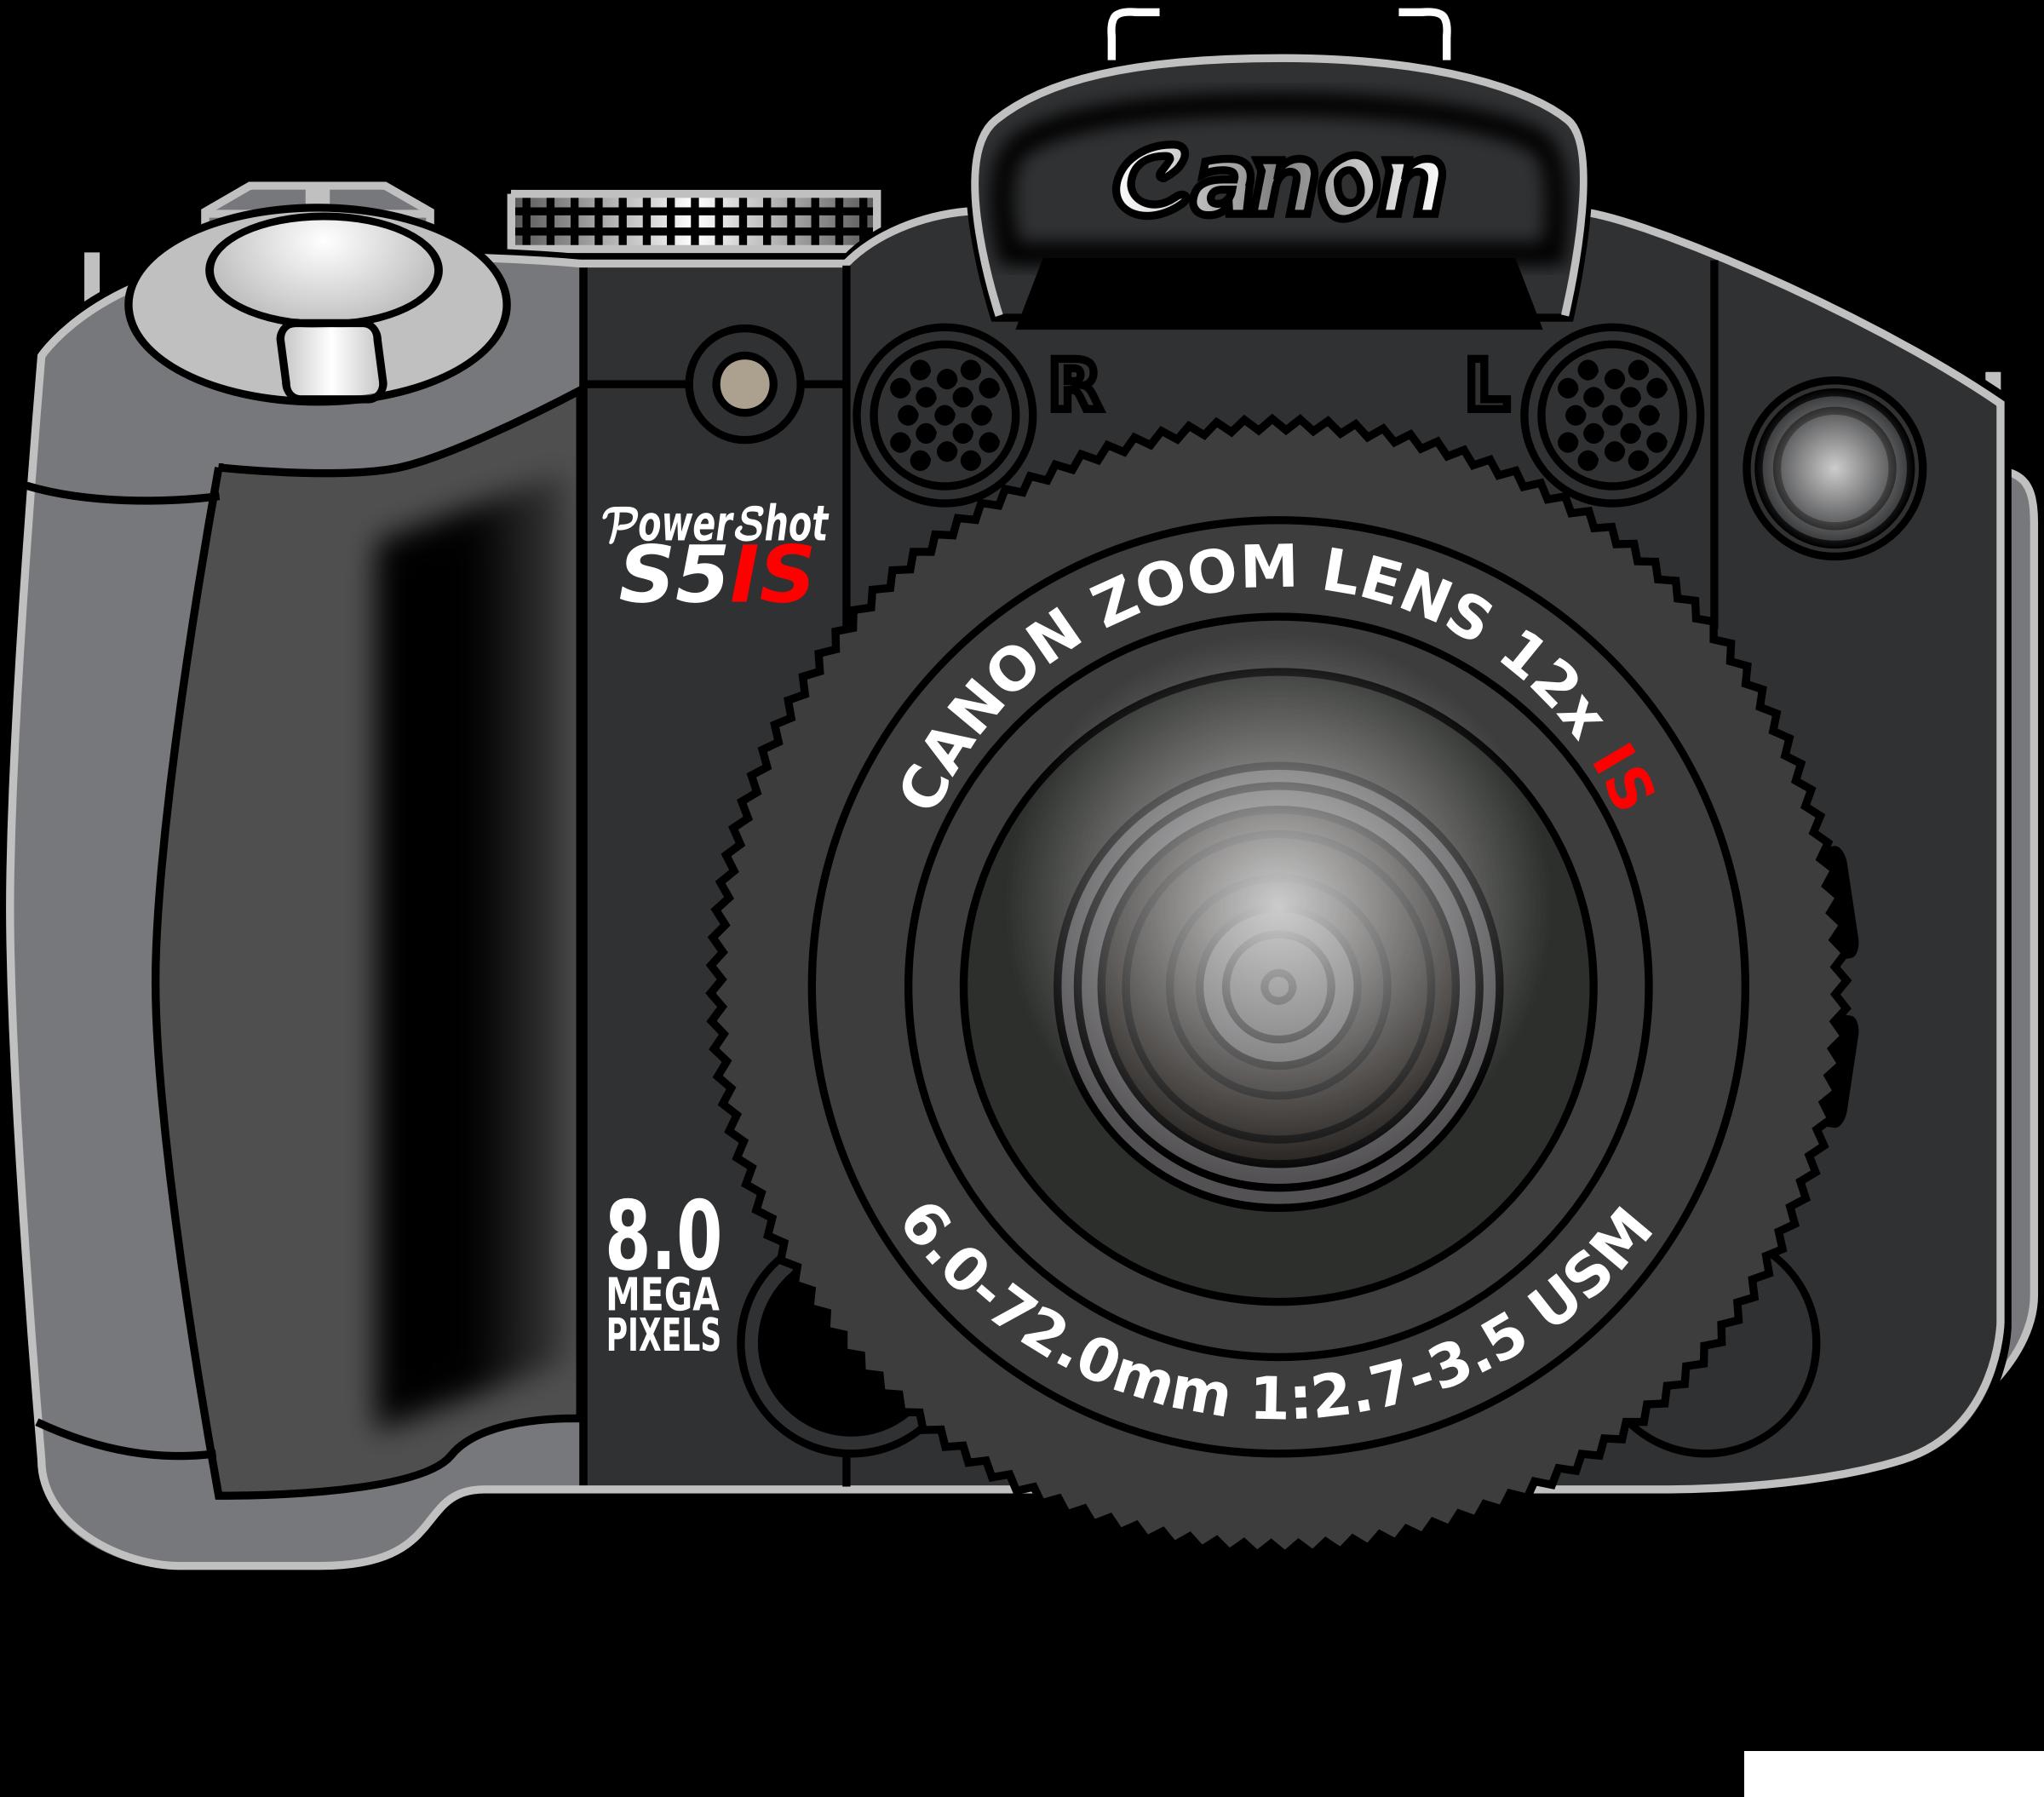 2400x2110 Canon Powershot Vector Clipart Image